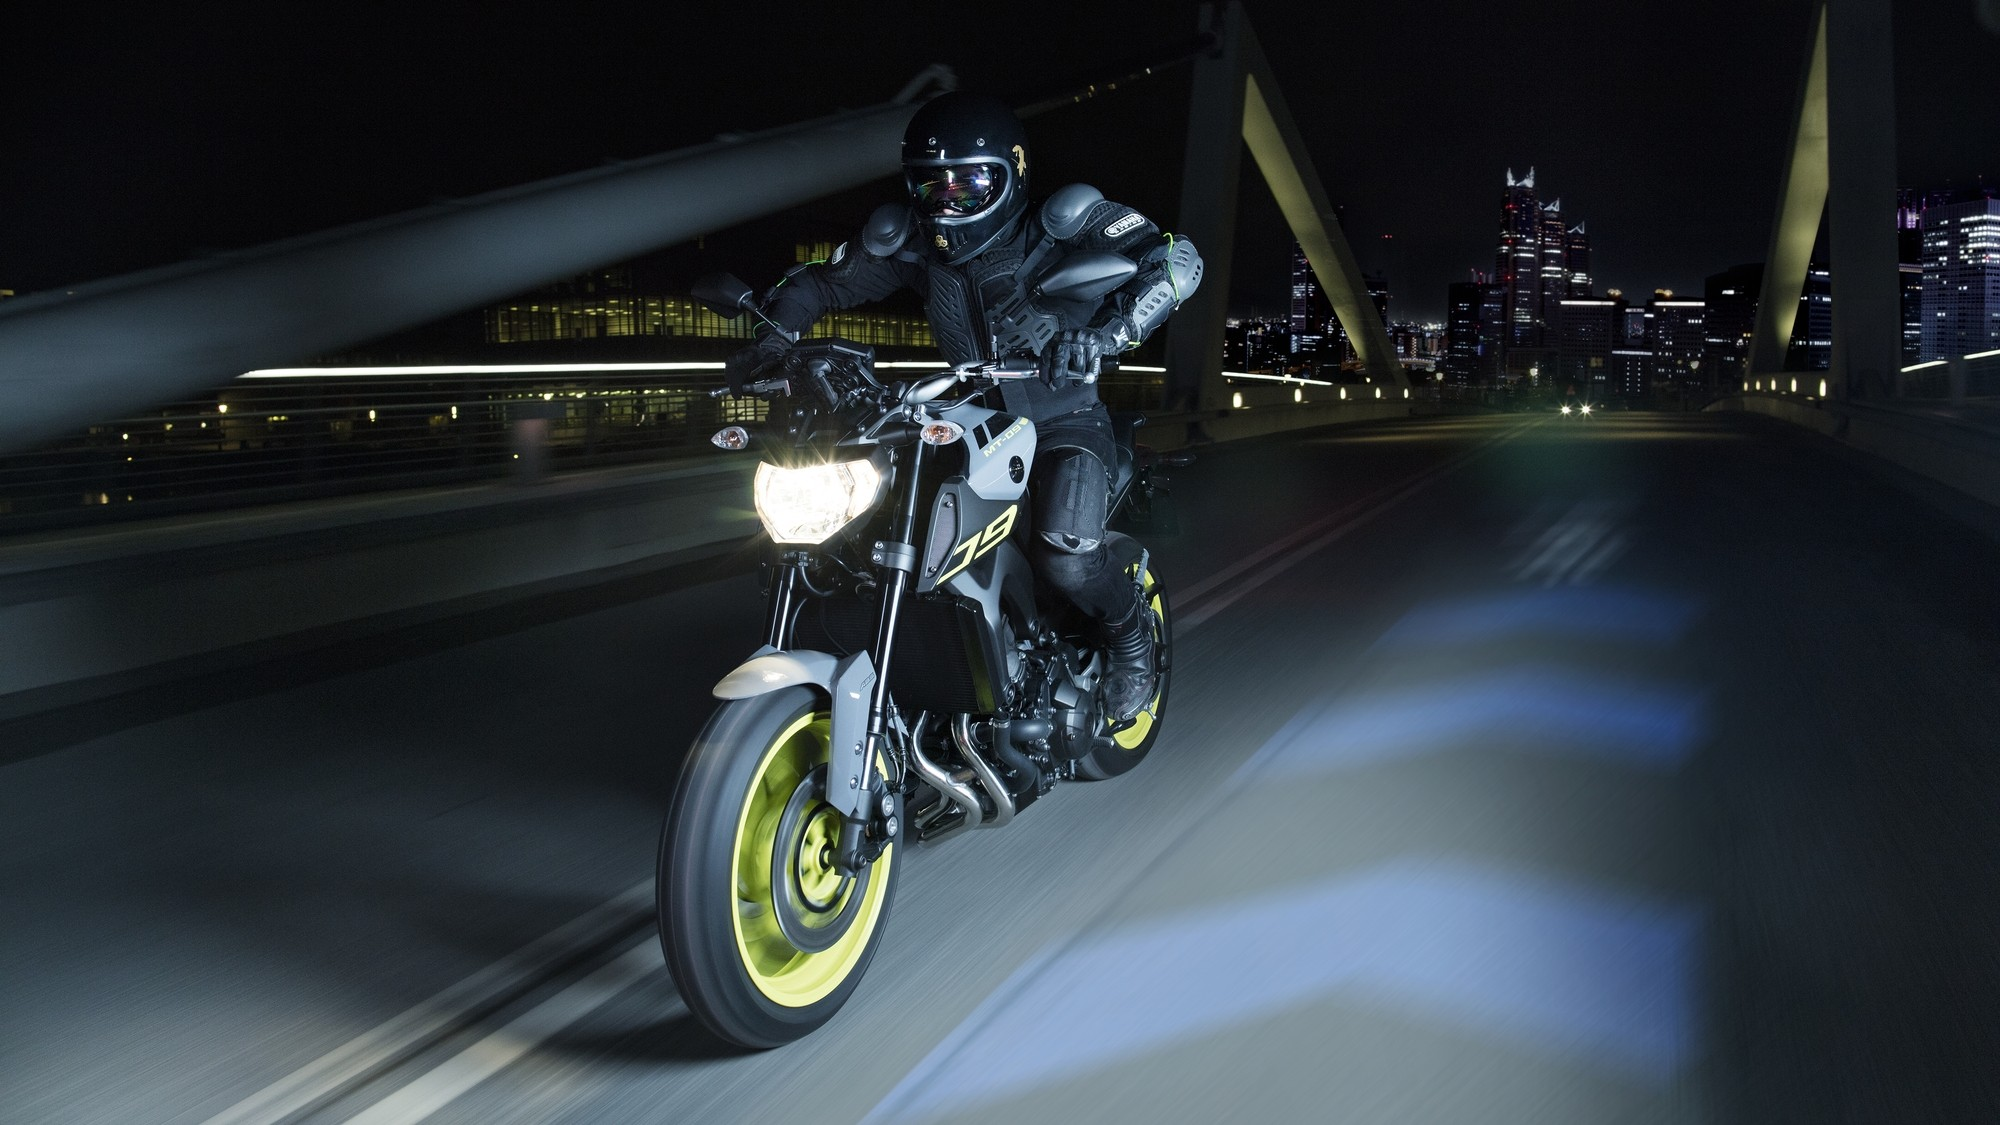 Kawasaki Wallpaper Hd Yamaha Adds Night Fluo To More Mt Bikes Shows The Mt 07